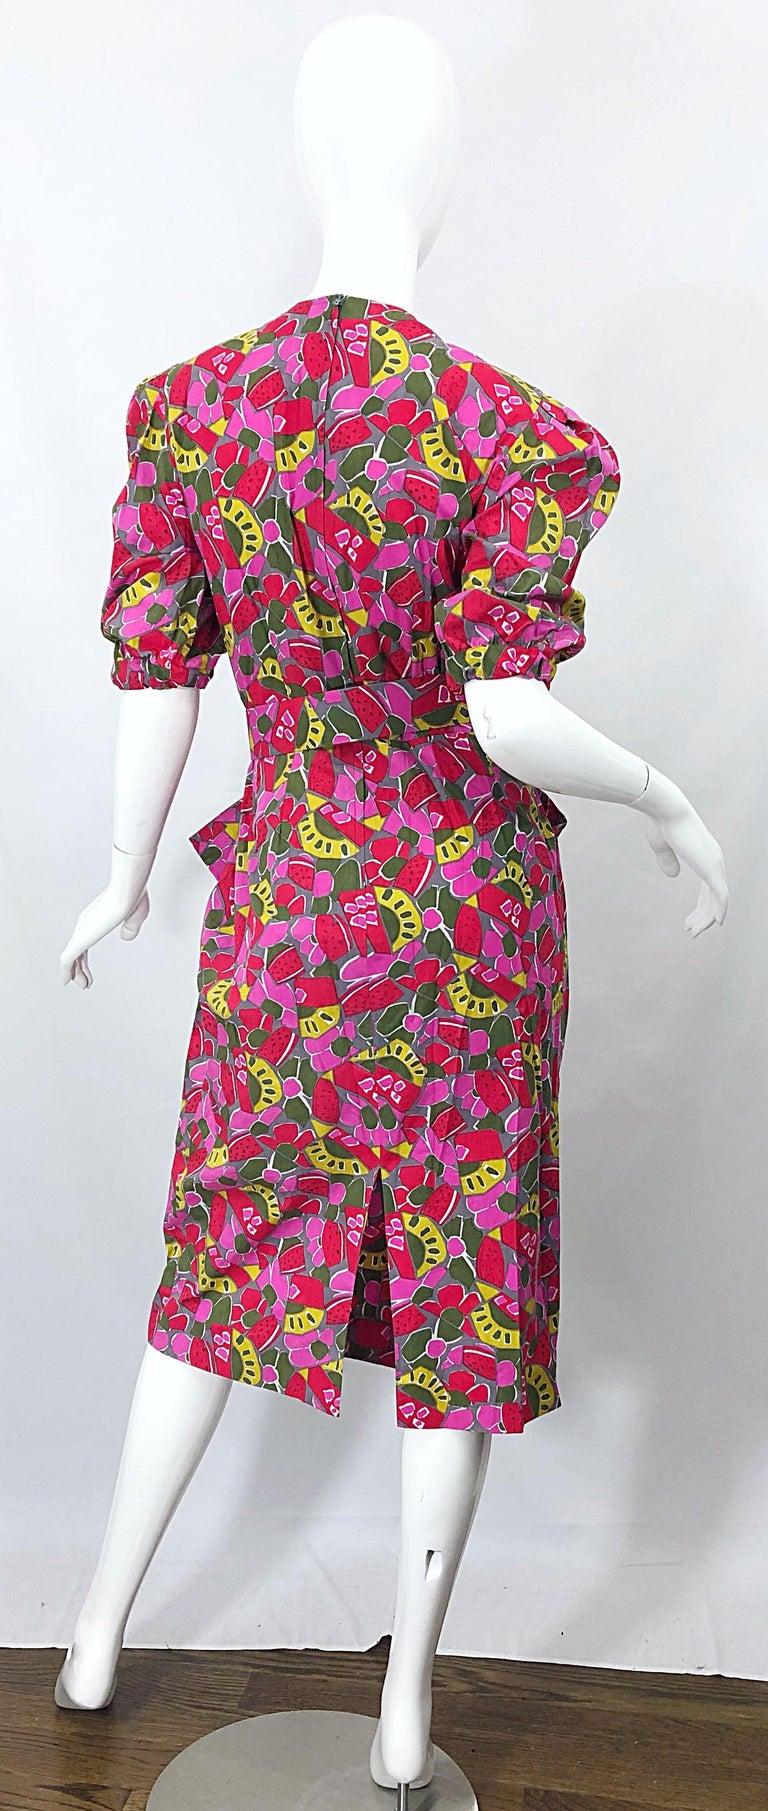 1980s Guy Laroche Size 44 / 12 Novelty Fruit Print Avant Garde Vintage 80s Dress For Sale 6